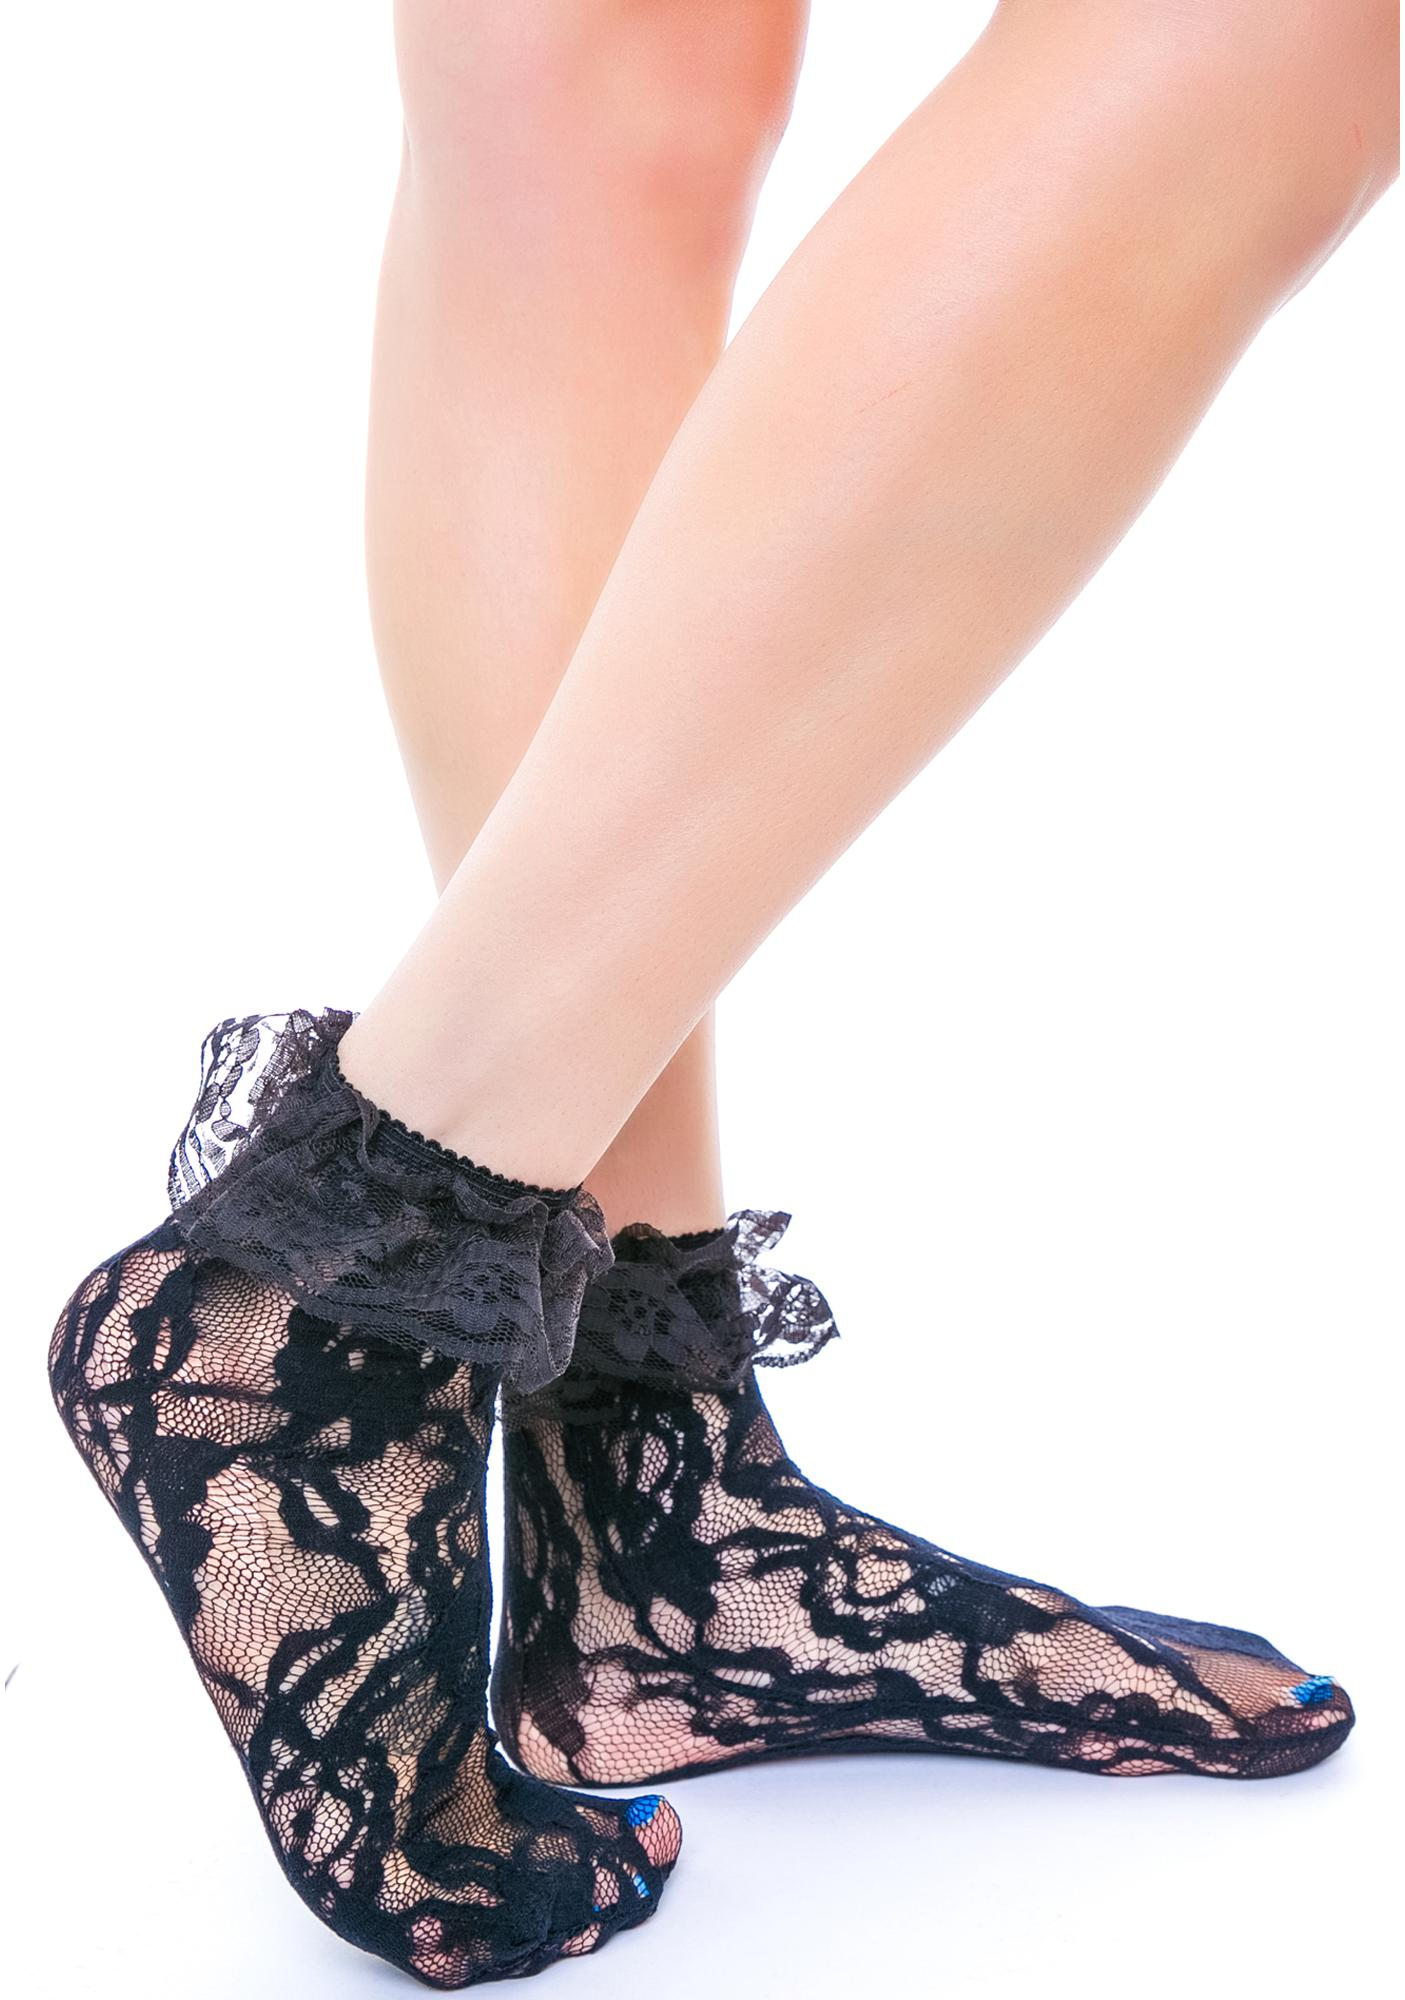 Lolita Lace Ruffle Ankle Socks